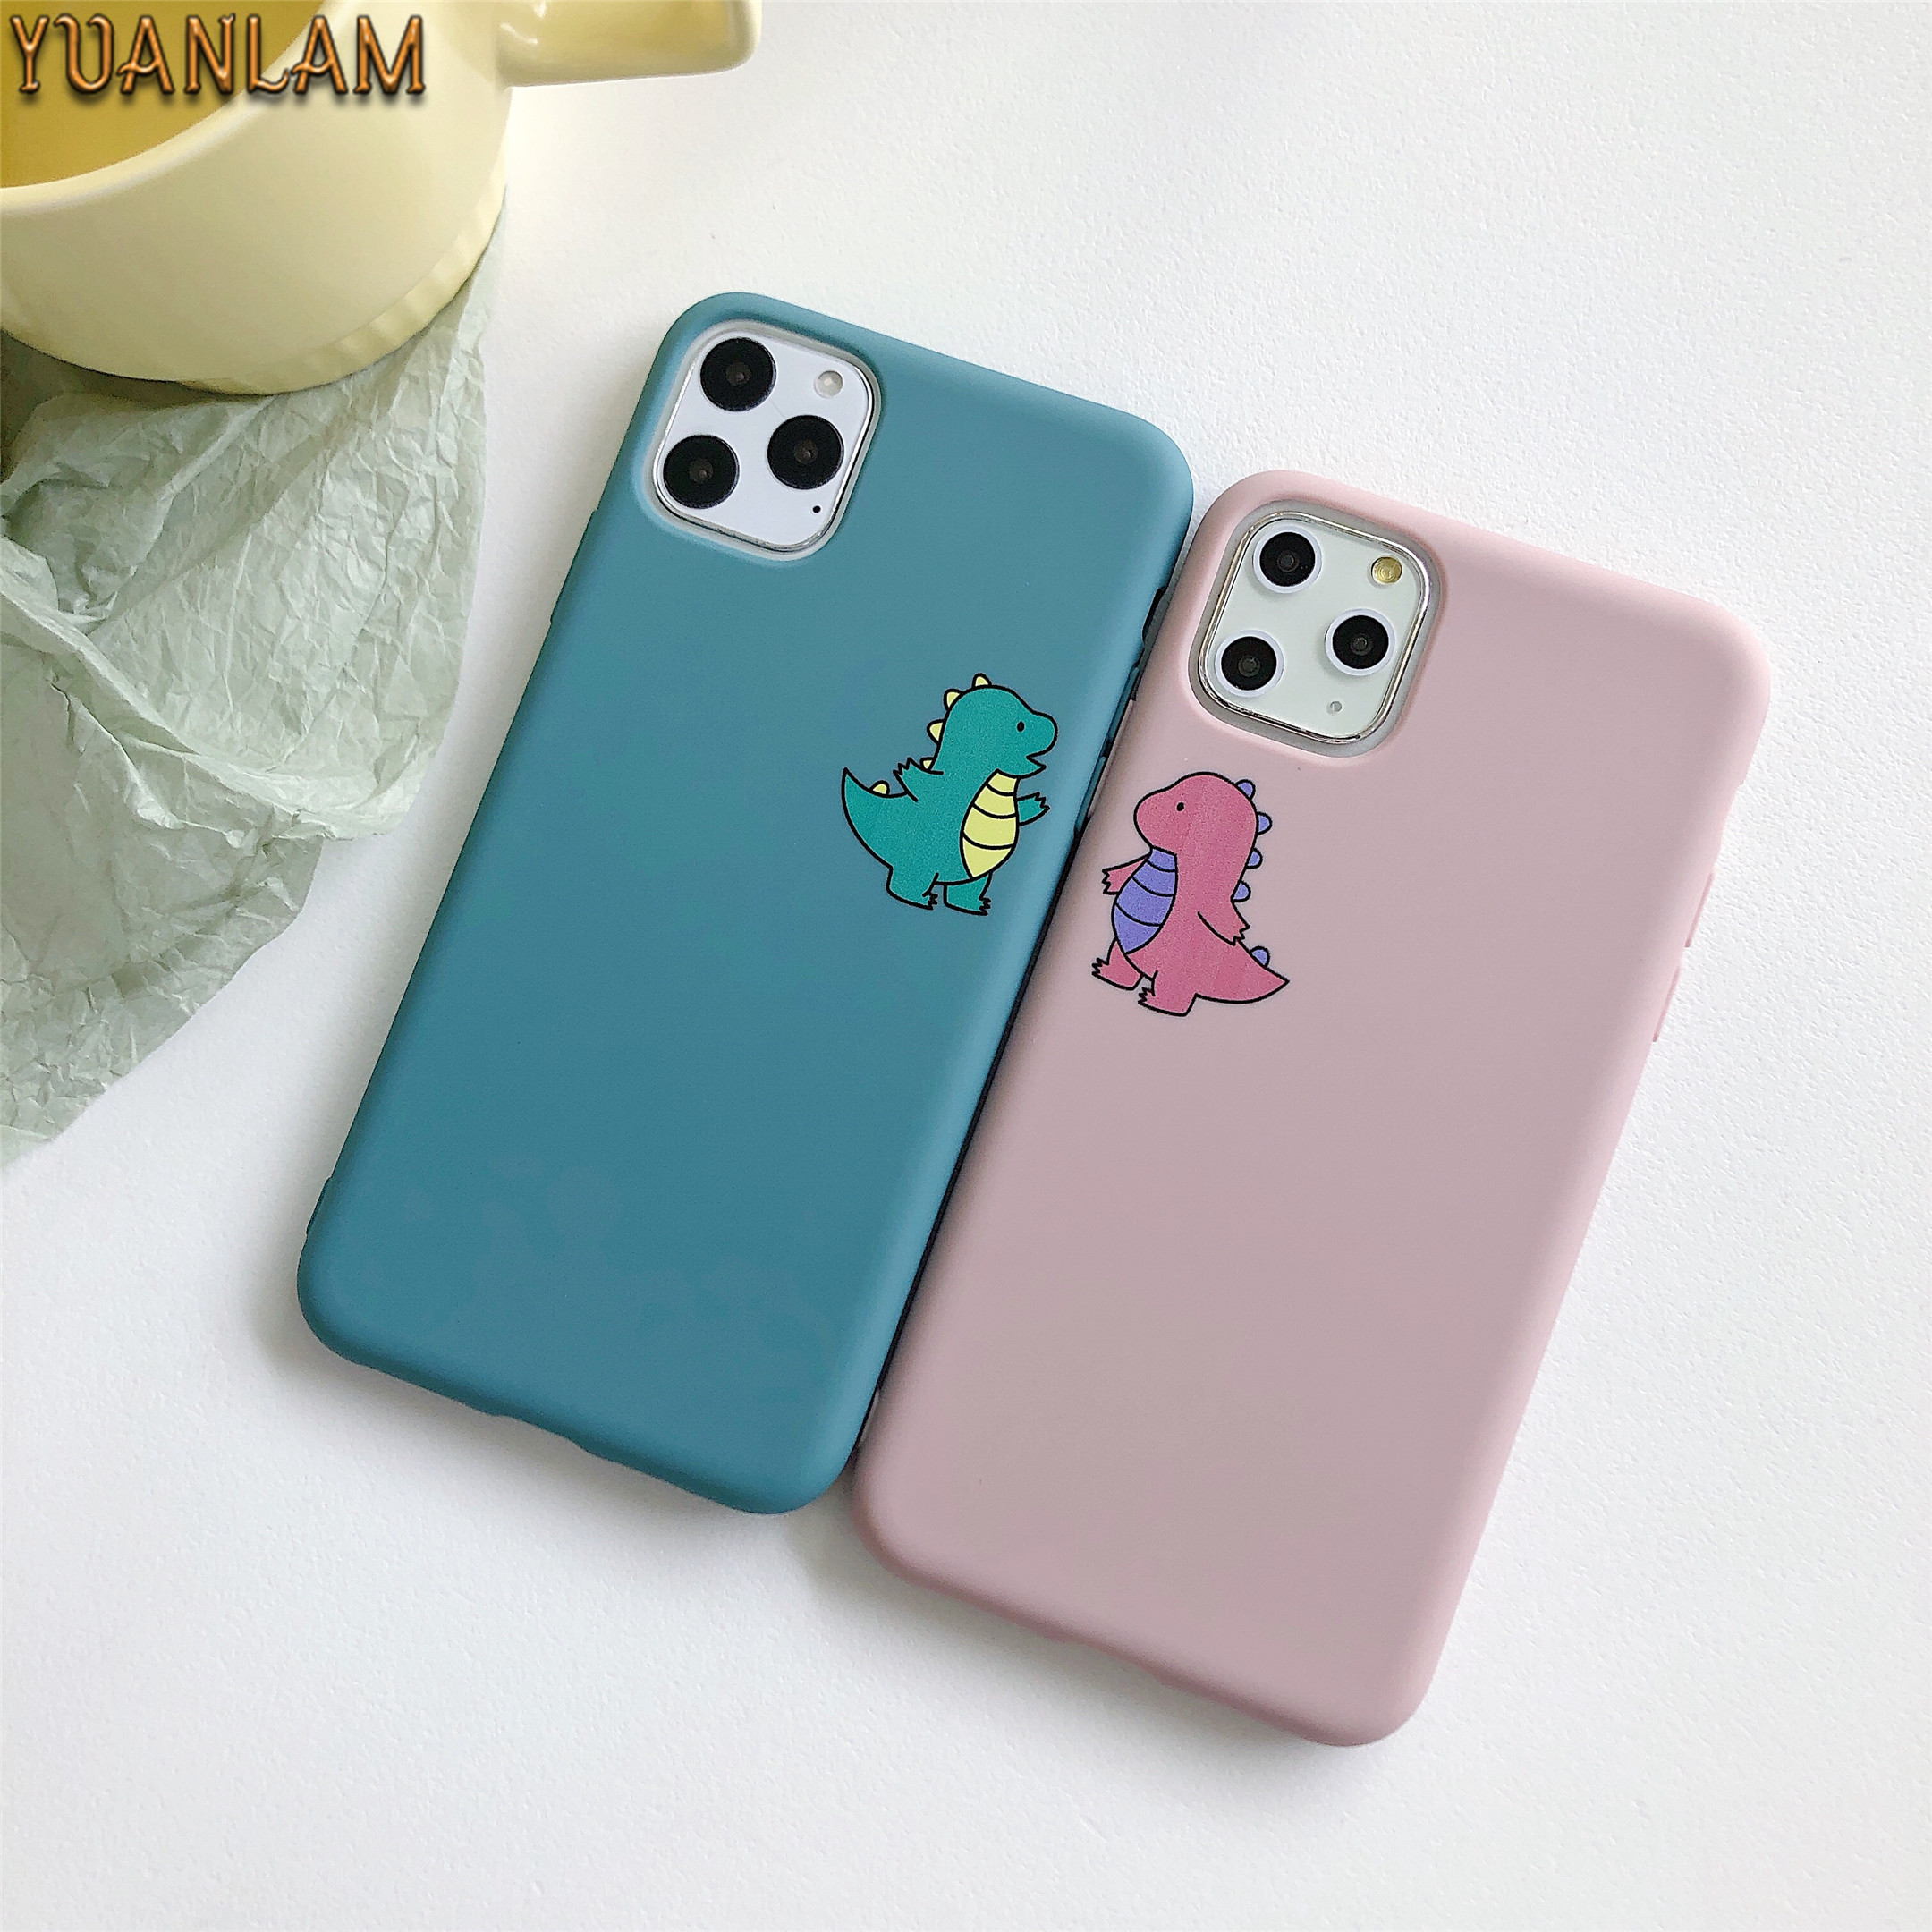 Dinosaur iphone 11 case